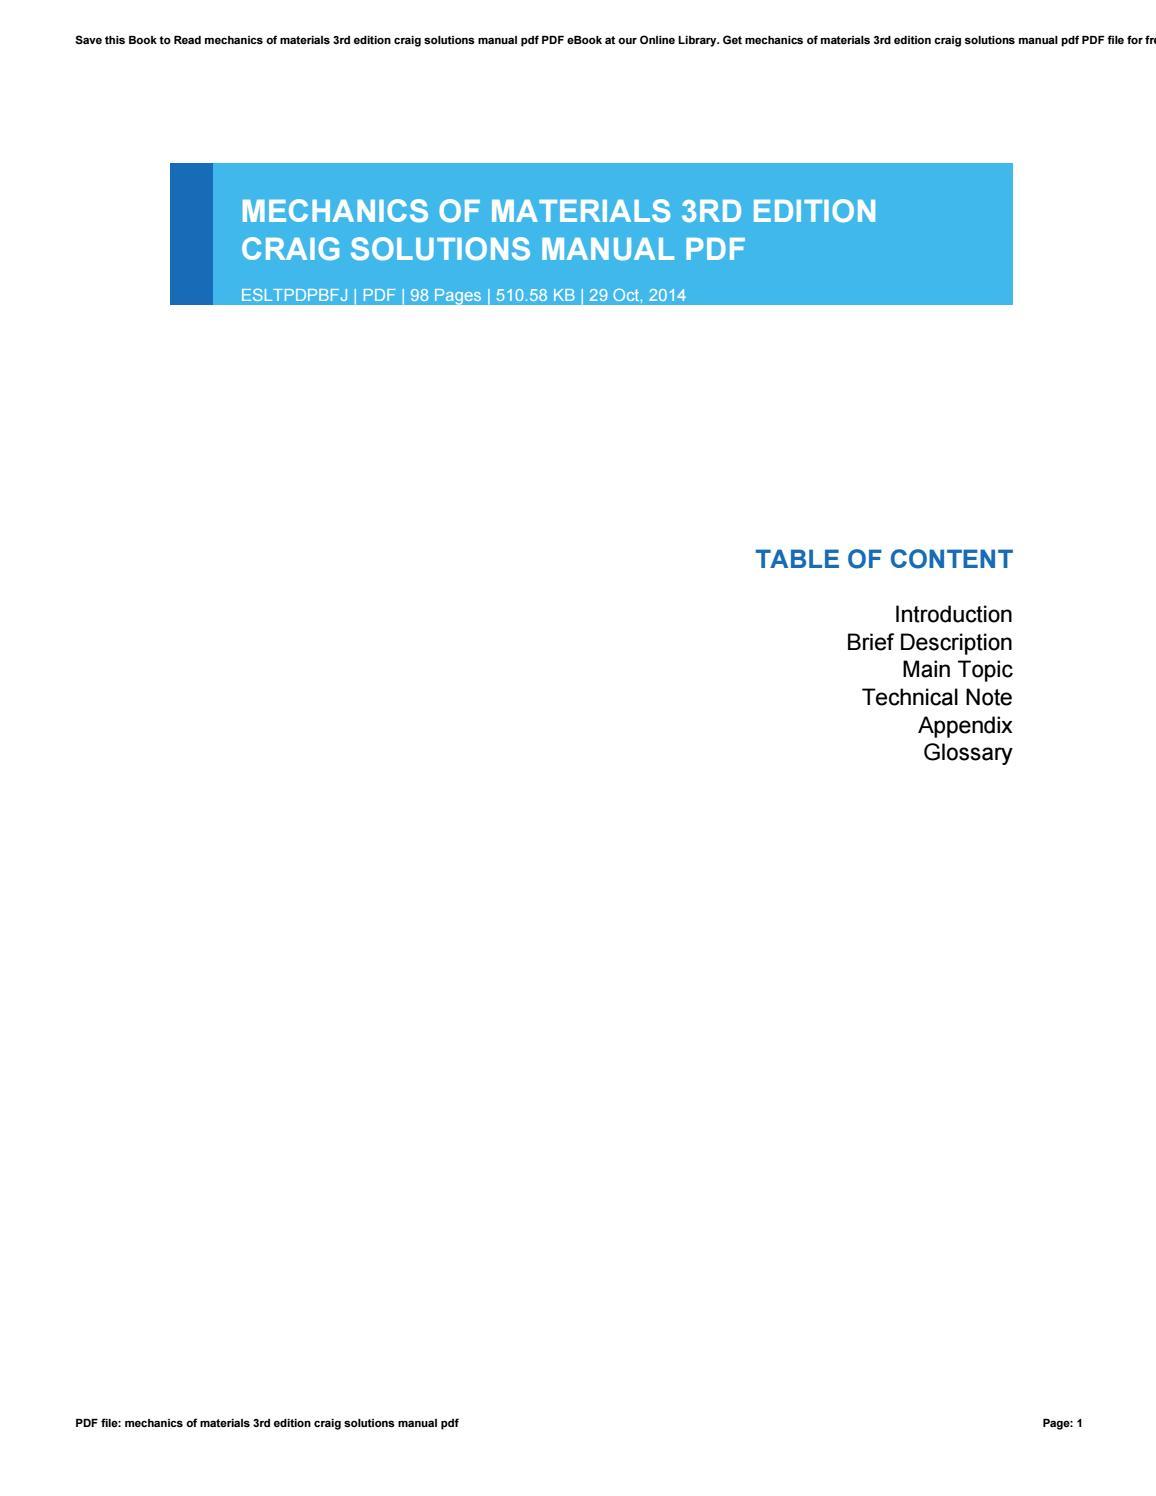 Mechanics of materials 3rd edition craig solutions manual pdf by AmyFox3156  - issuu